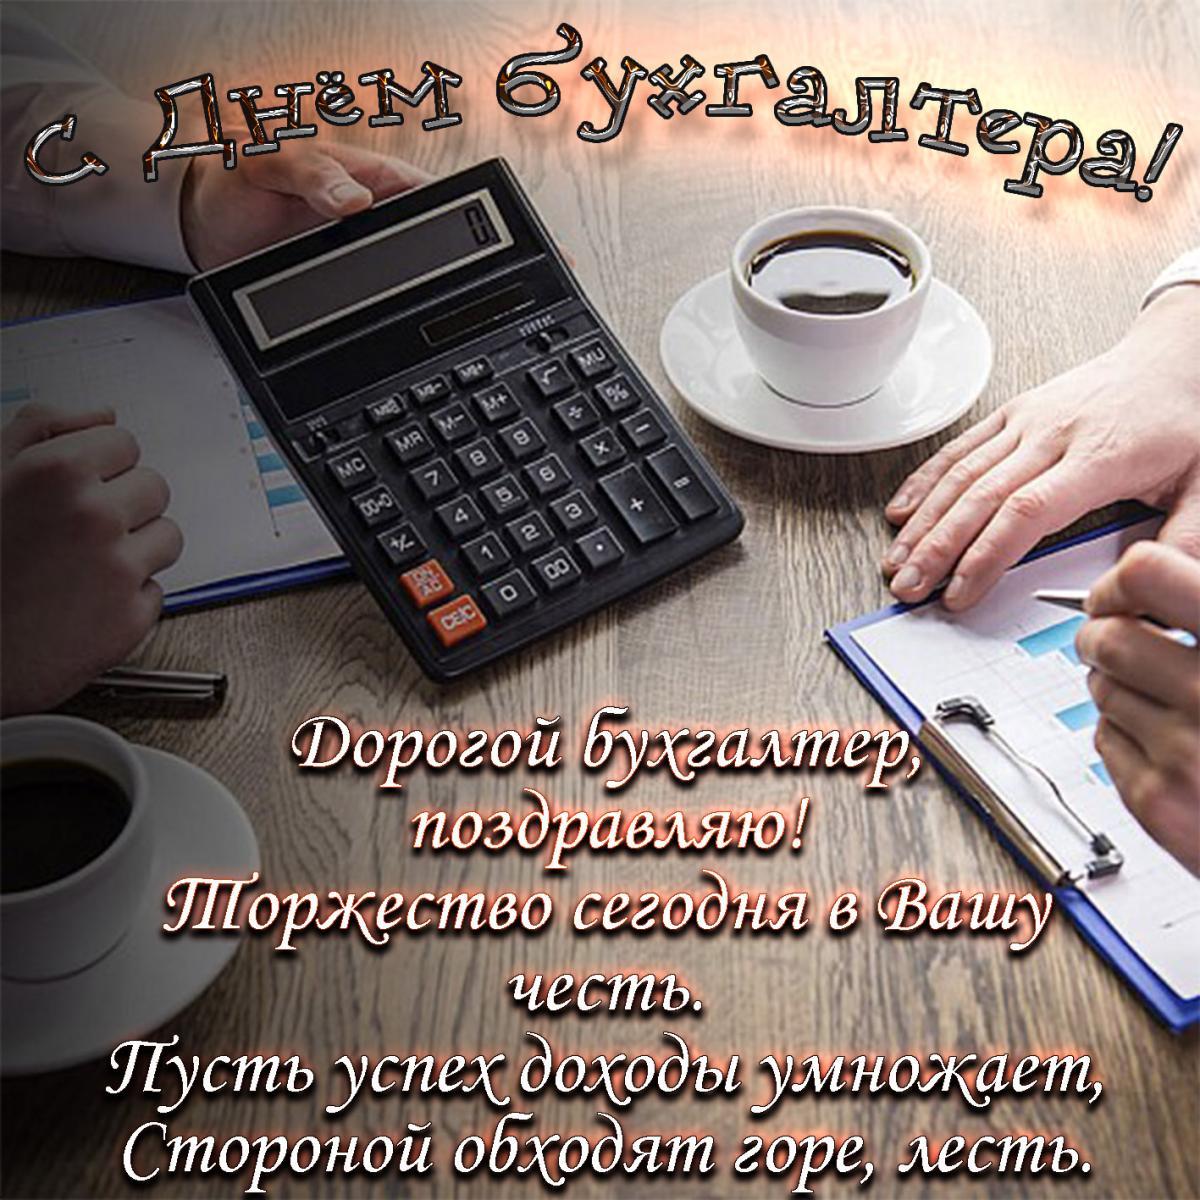 З днем бухгалтера вітаю / фото bonnycards.ru